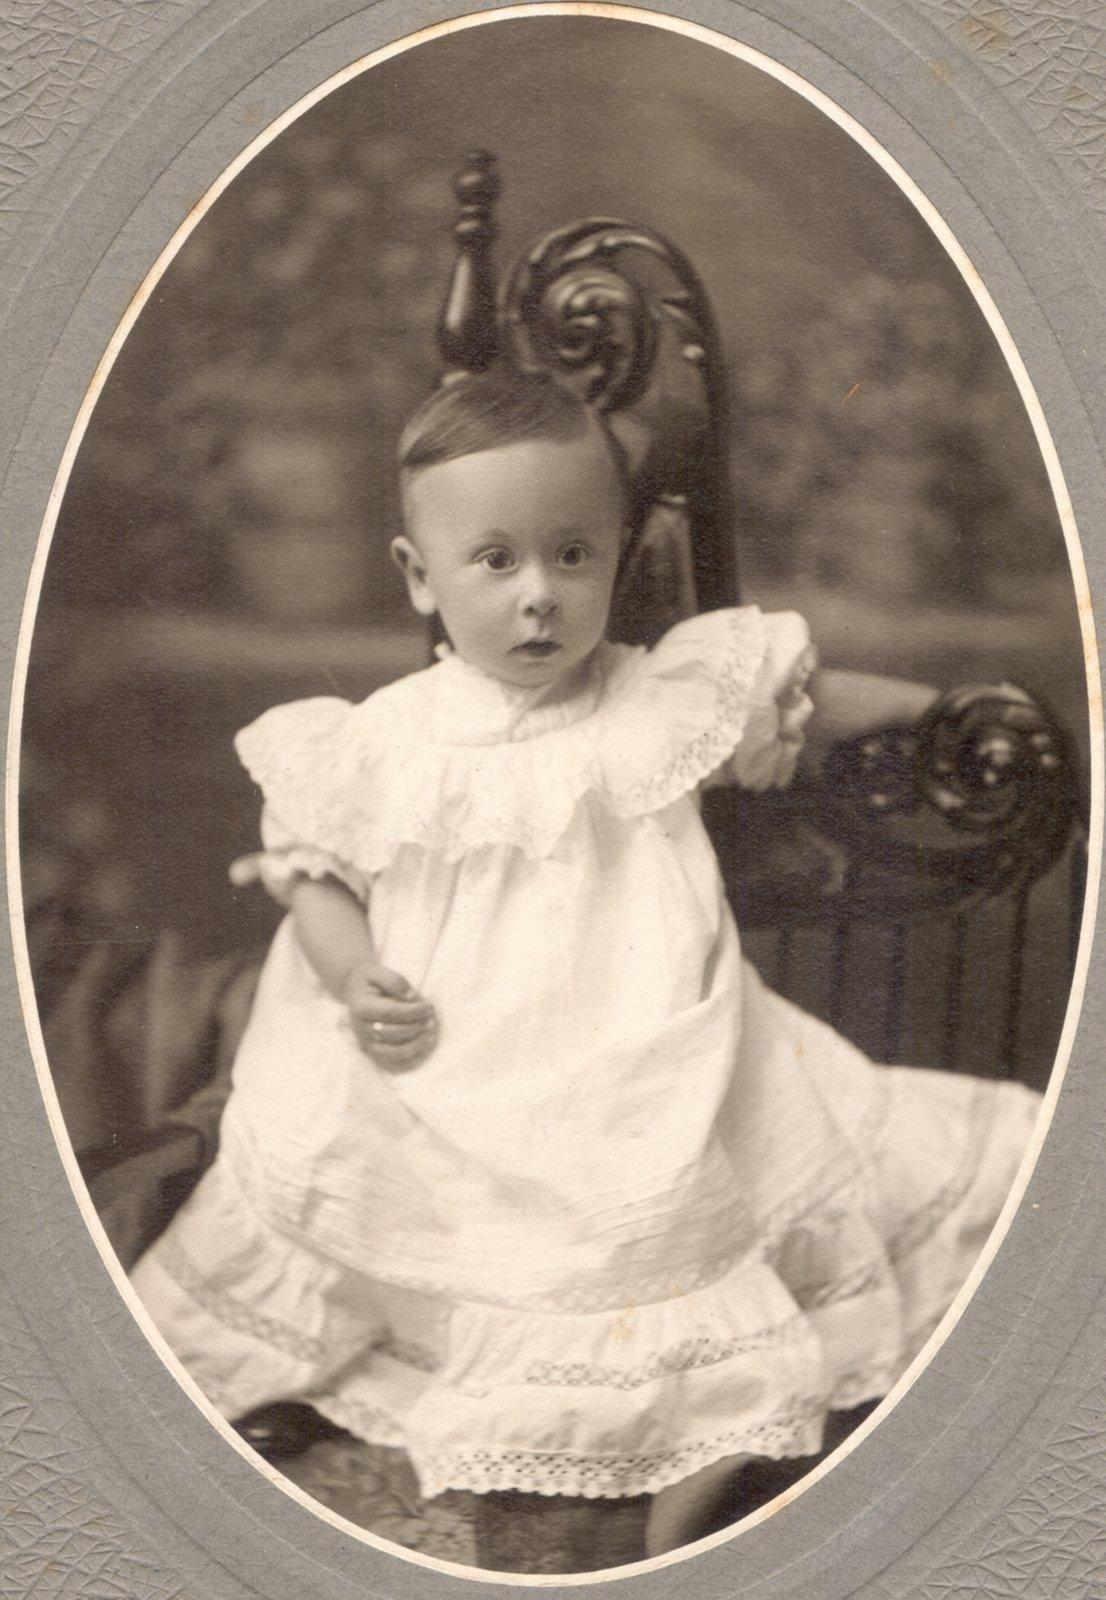 Baby - Ratz Family, Kitchener, Ontario: Waterloo Public Library ...